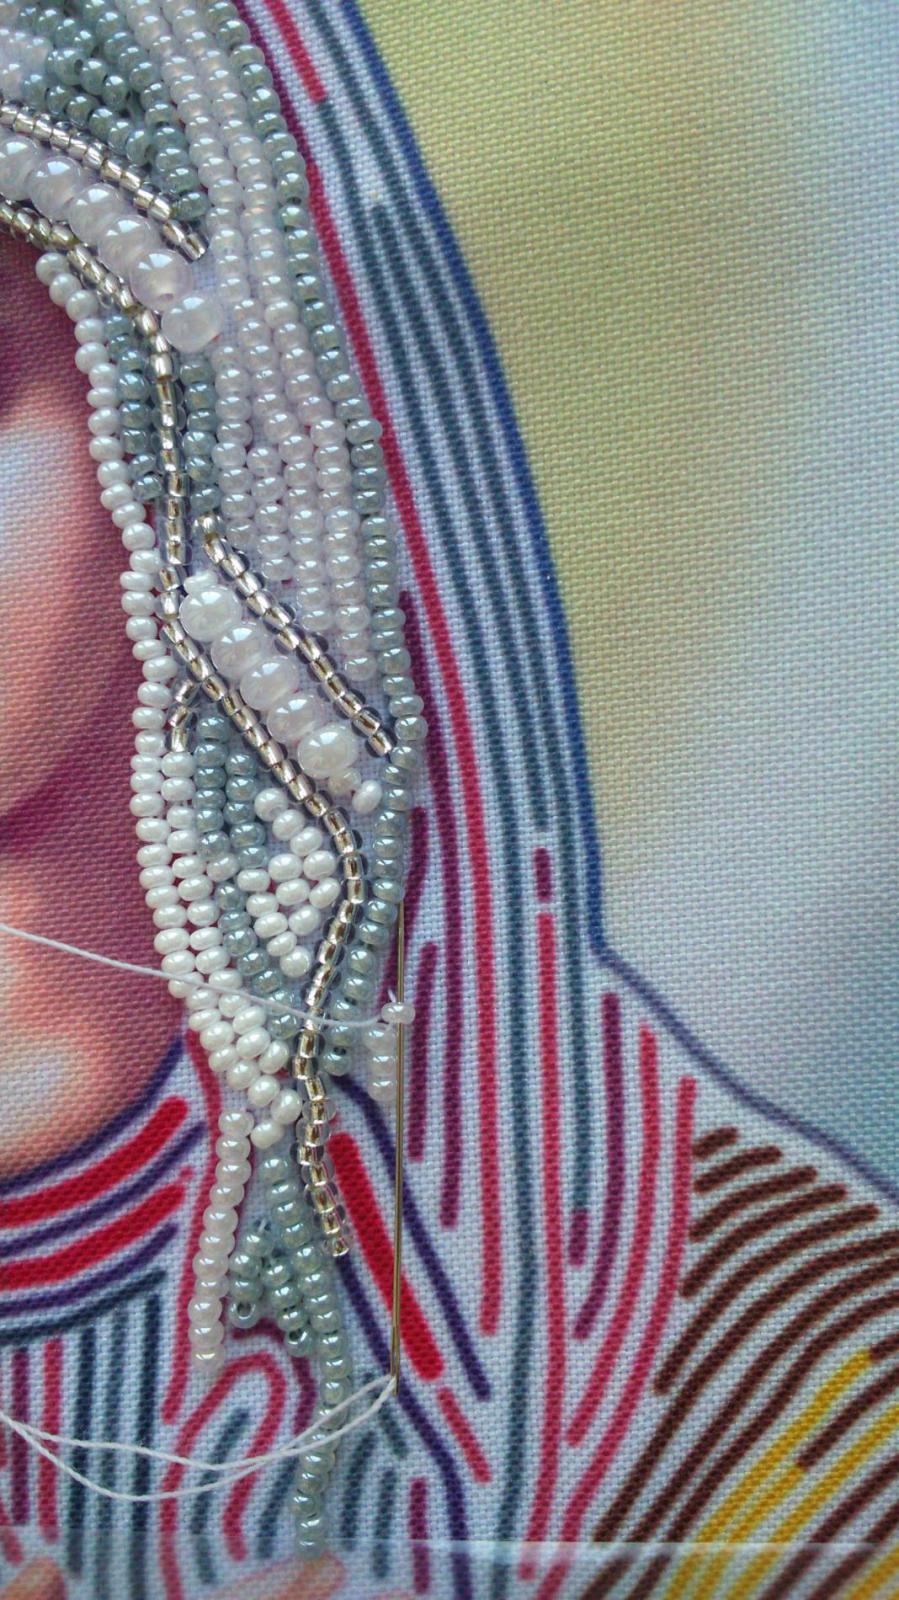 Вышивка бисером вприкреп на проволоке 94